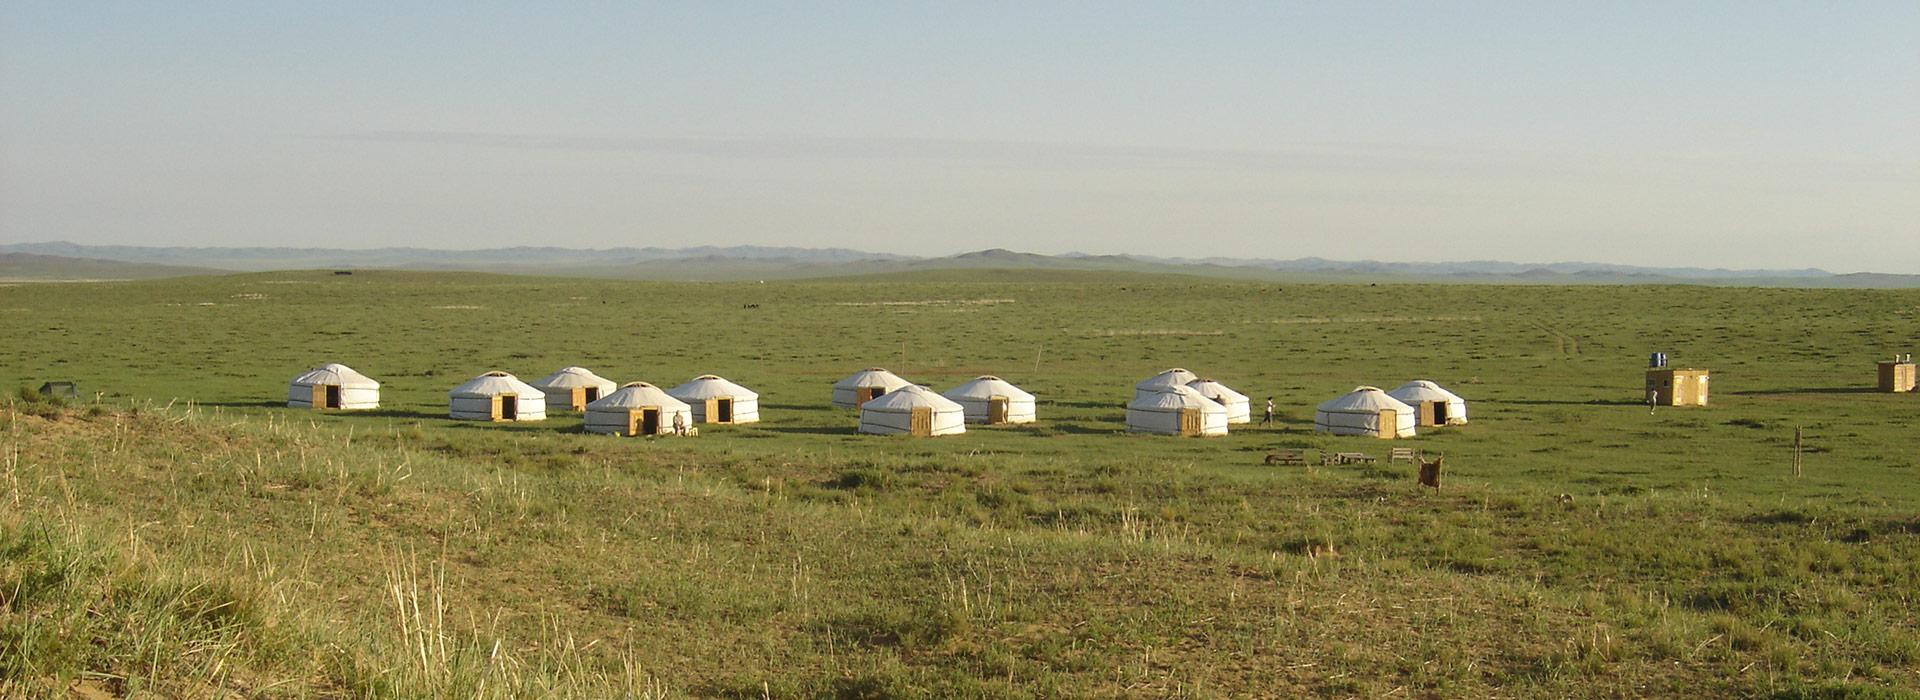 arburd-sands-ger-camp